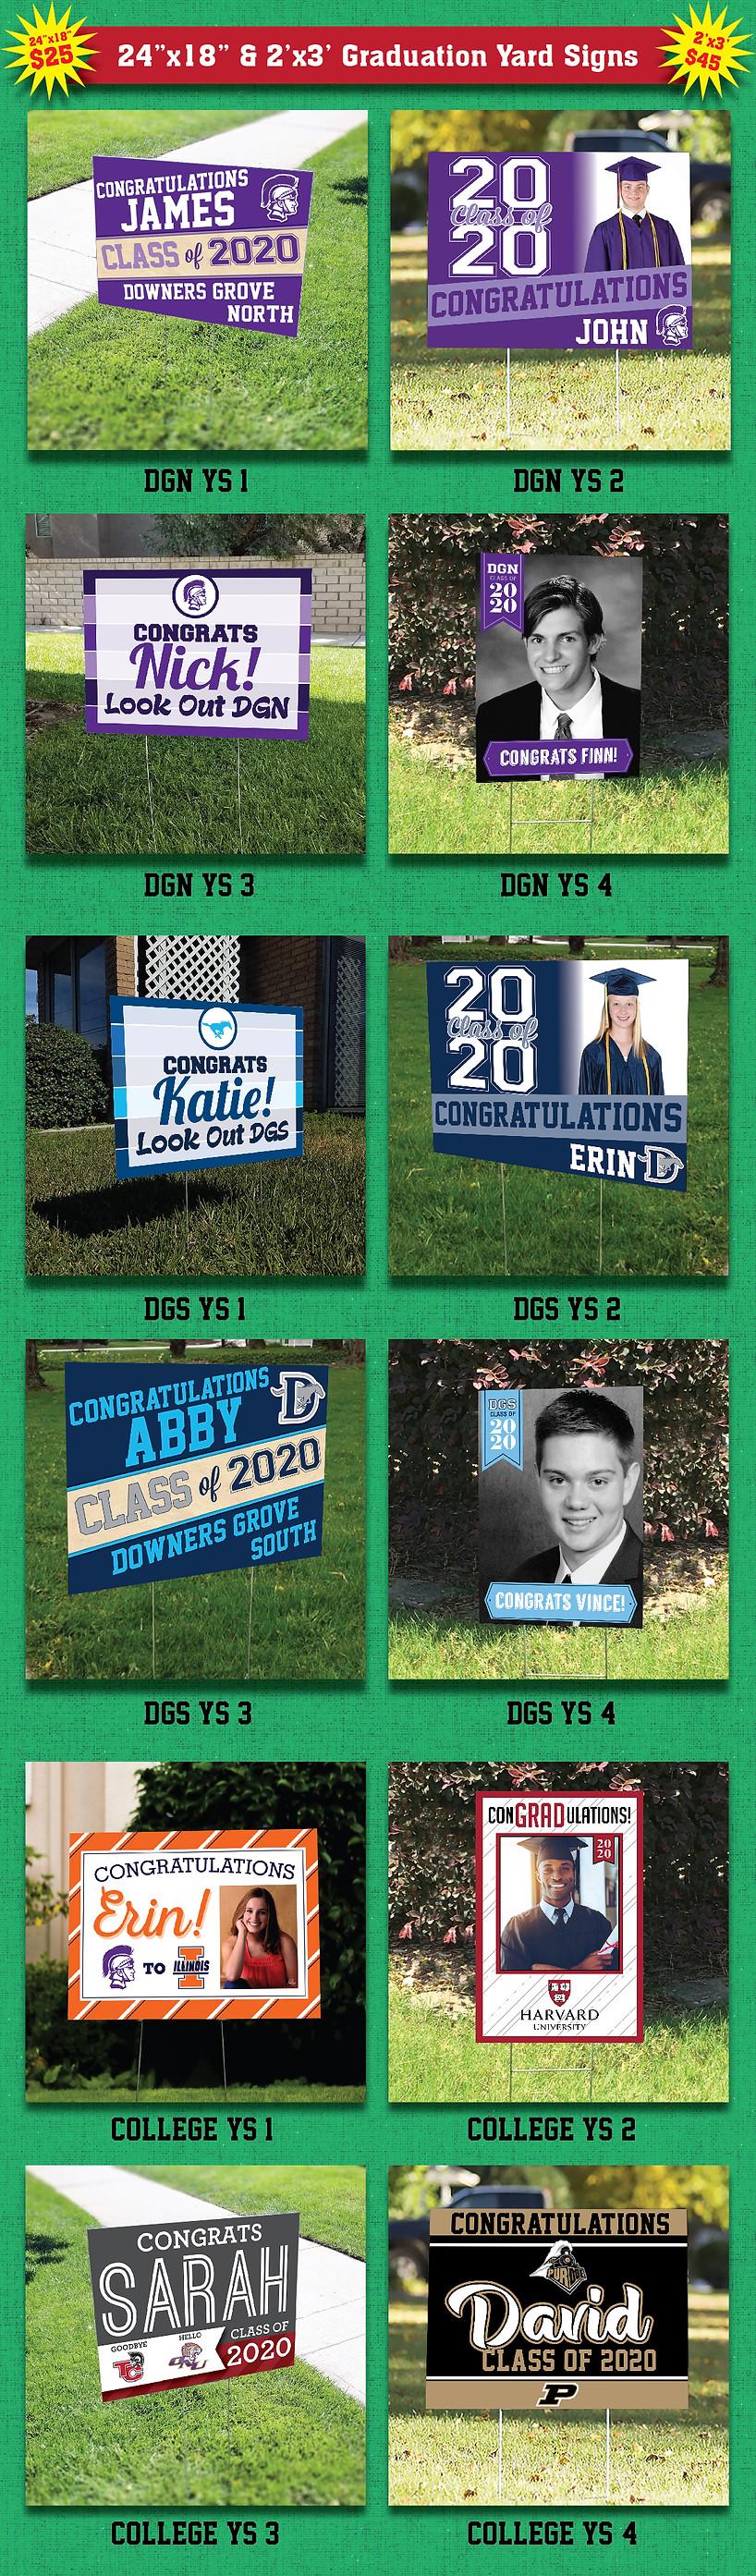 yard sign samples for wix-01.jpg